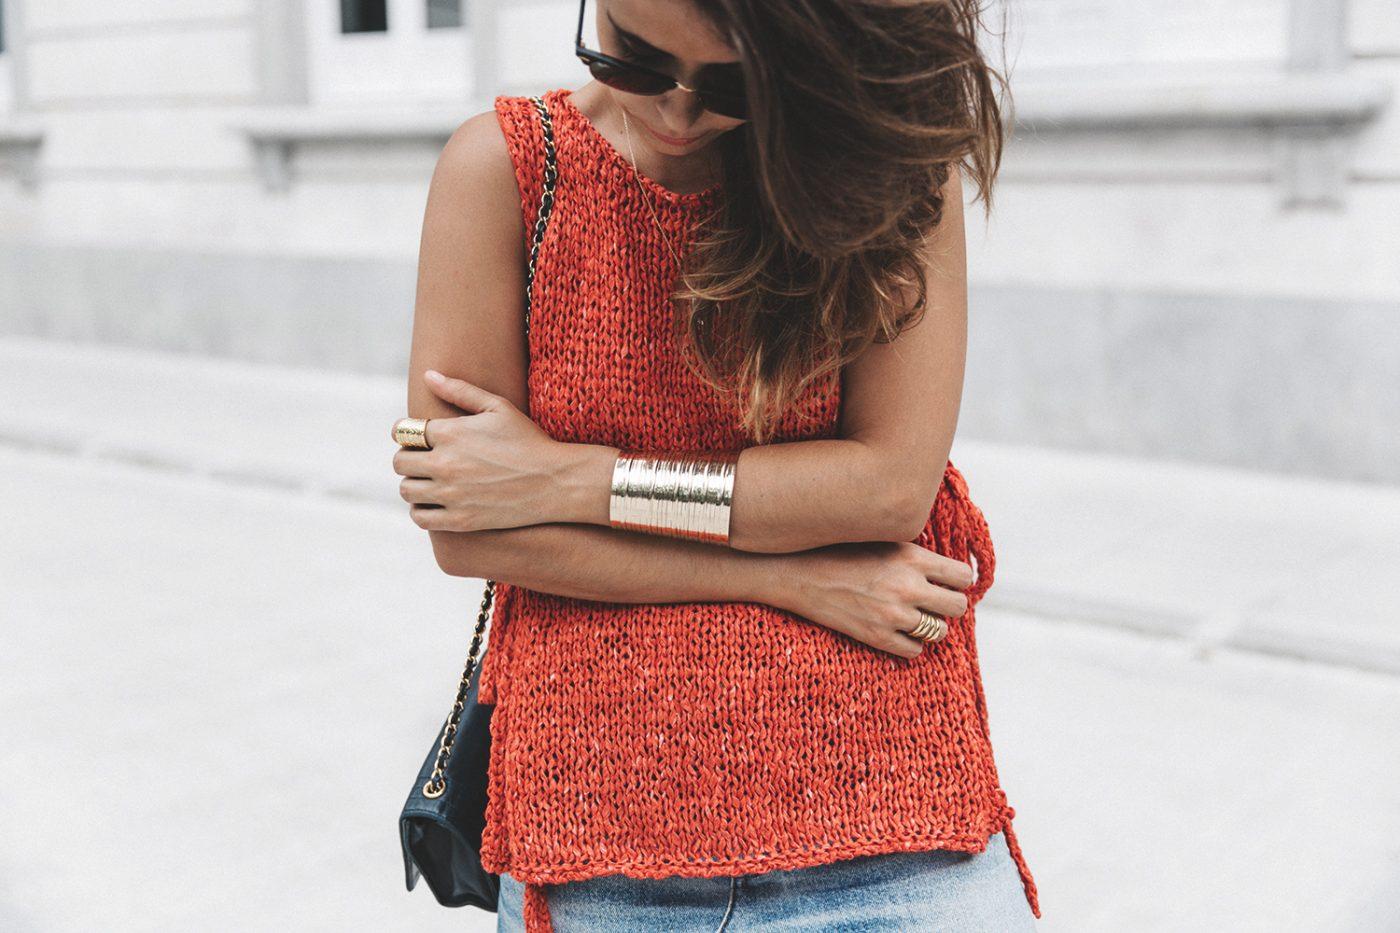 Summery_knit-Levis_Vintage_Skirt-Zalando_Espadrilles-Black_Sandals-Collage_Vintage_Horn_Necklace-Outfit-Street_Style-22